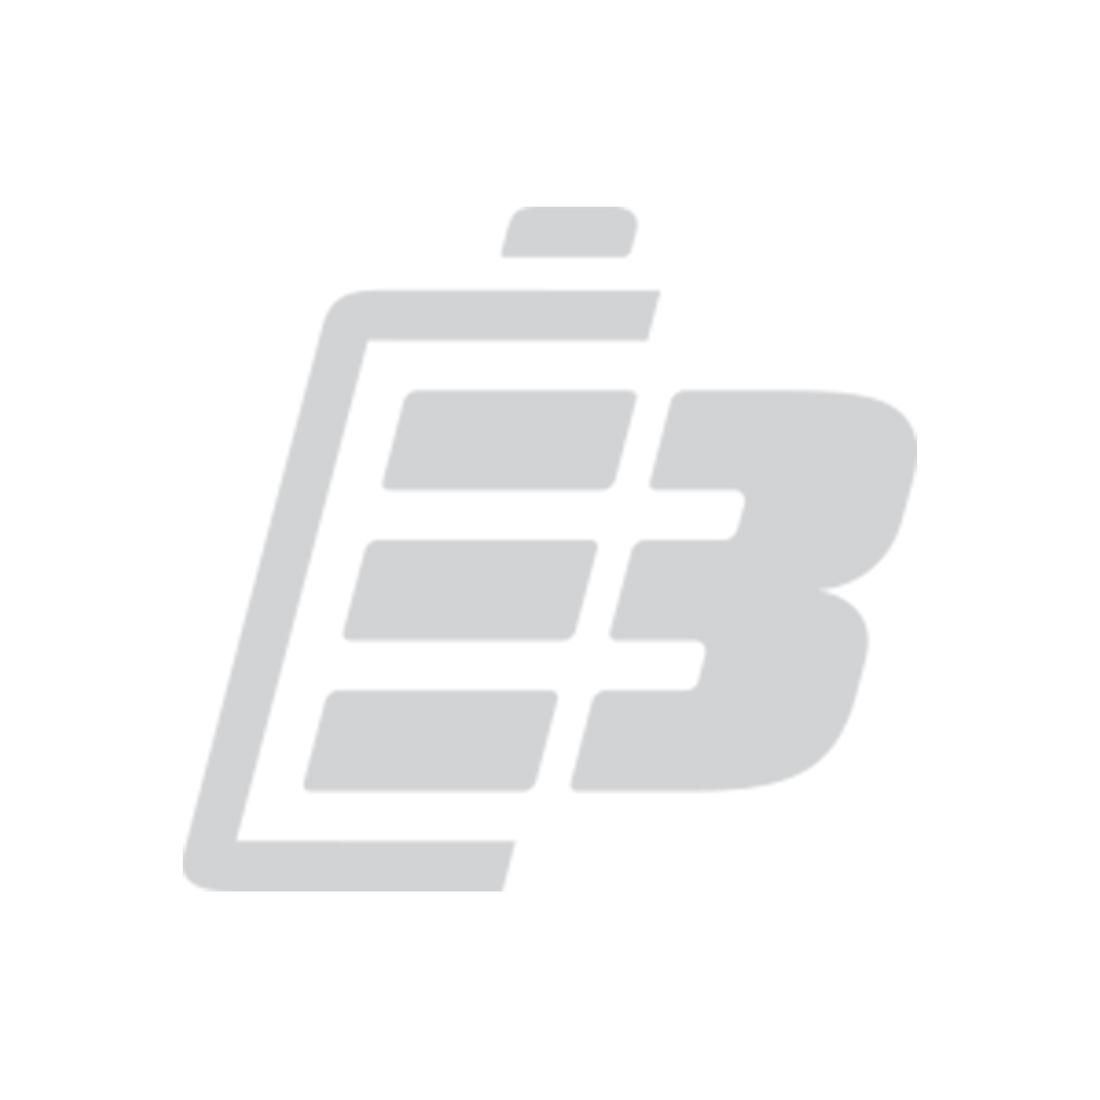 Duracell Procell MN1604 9V 6LR61